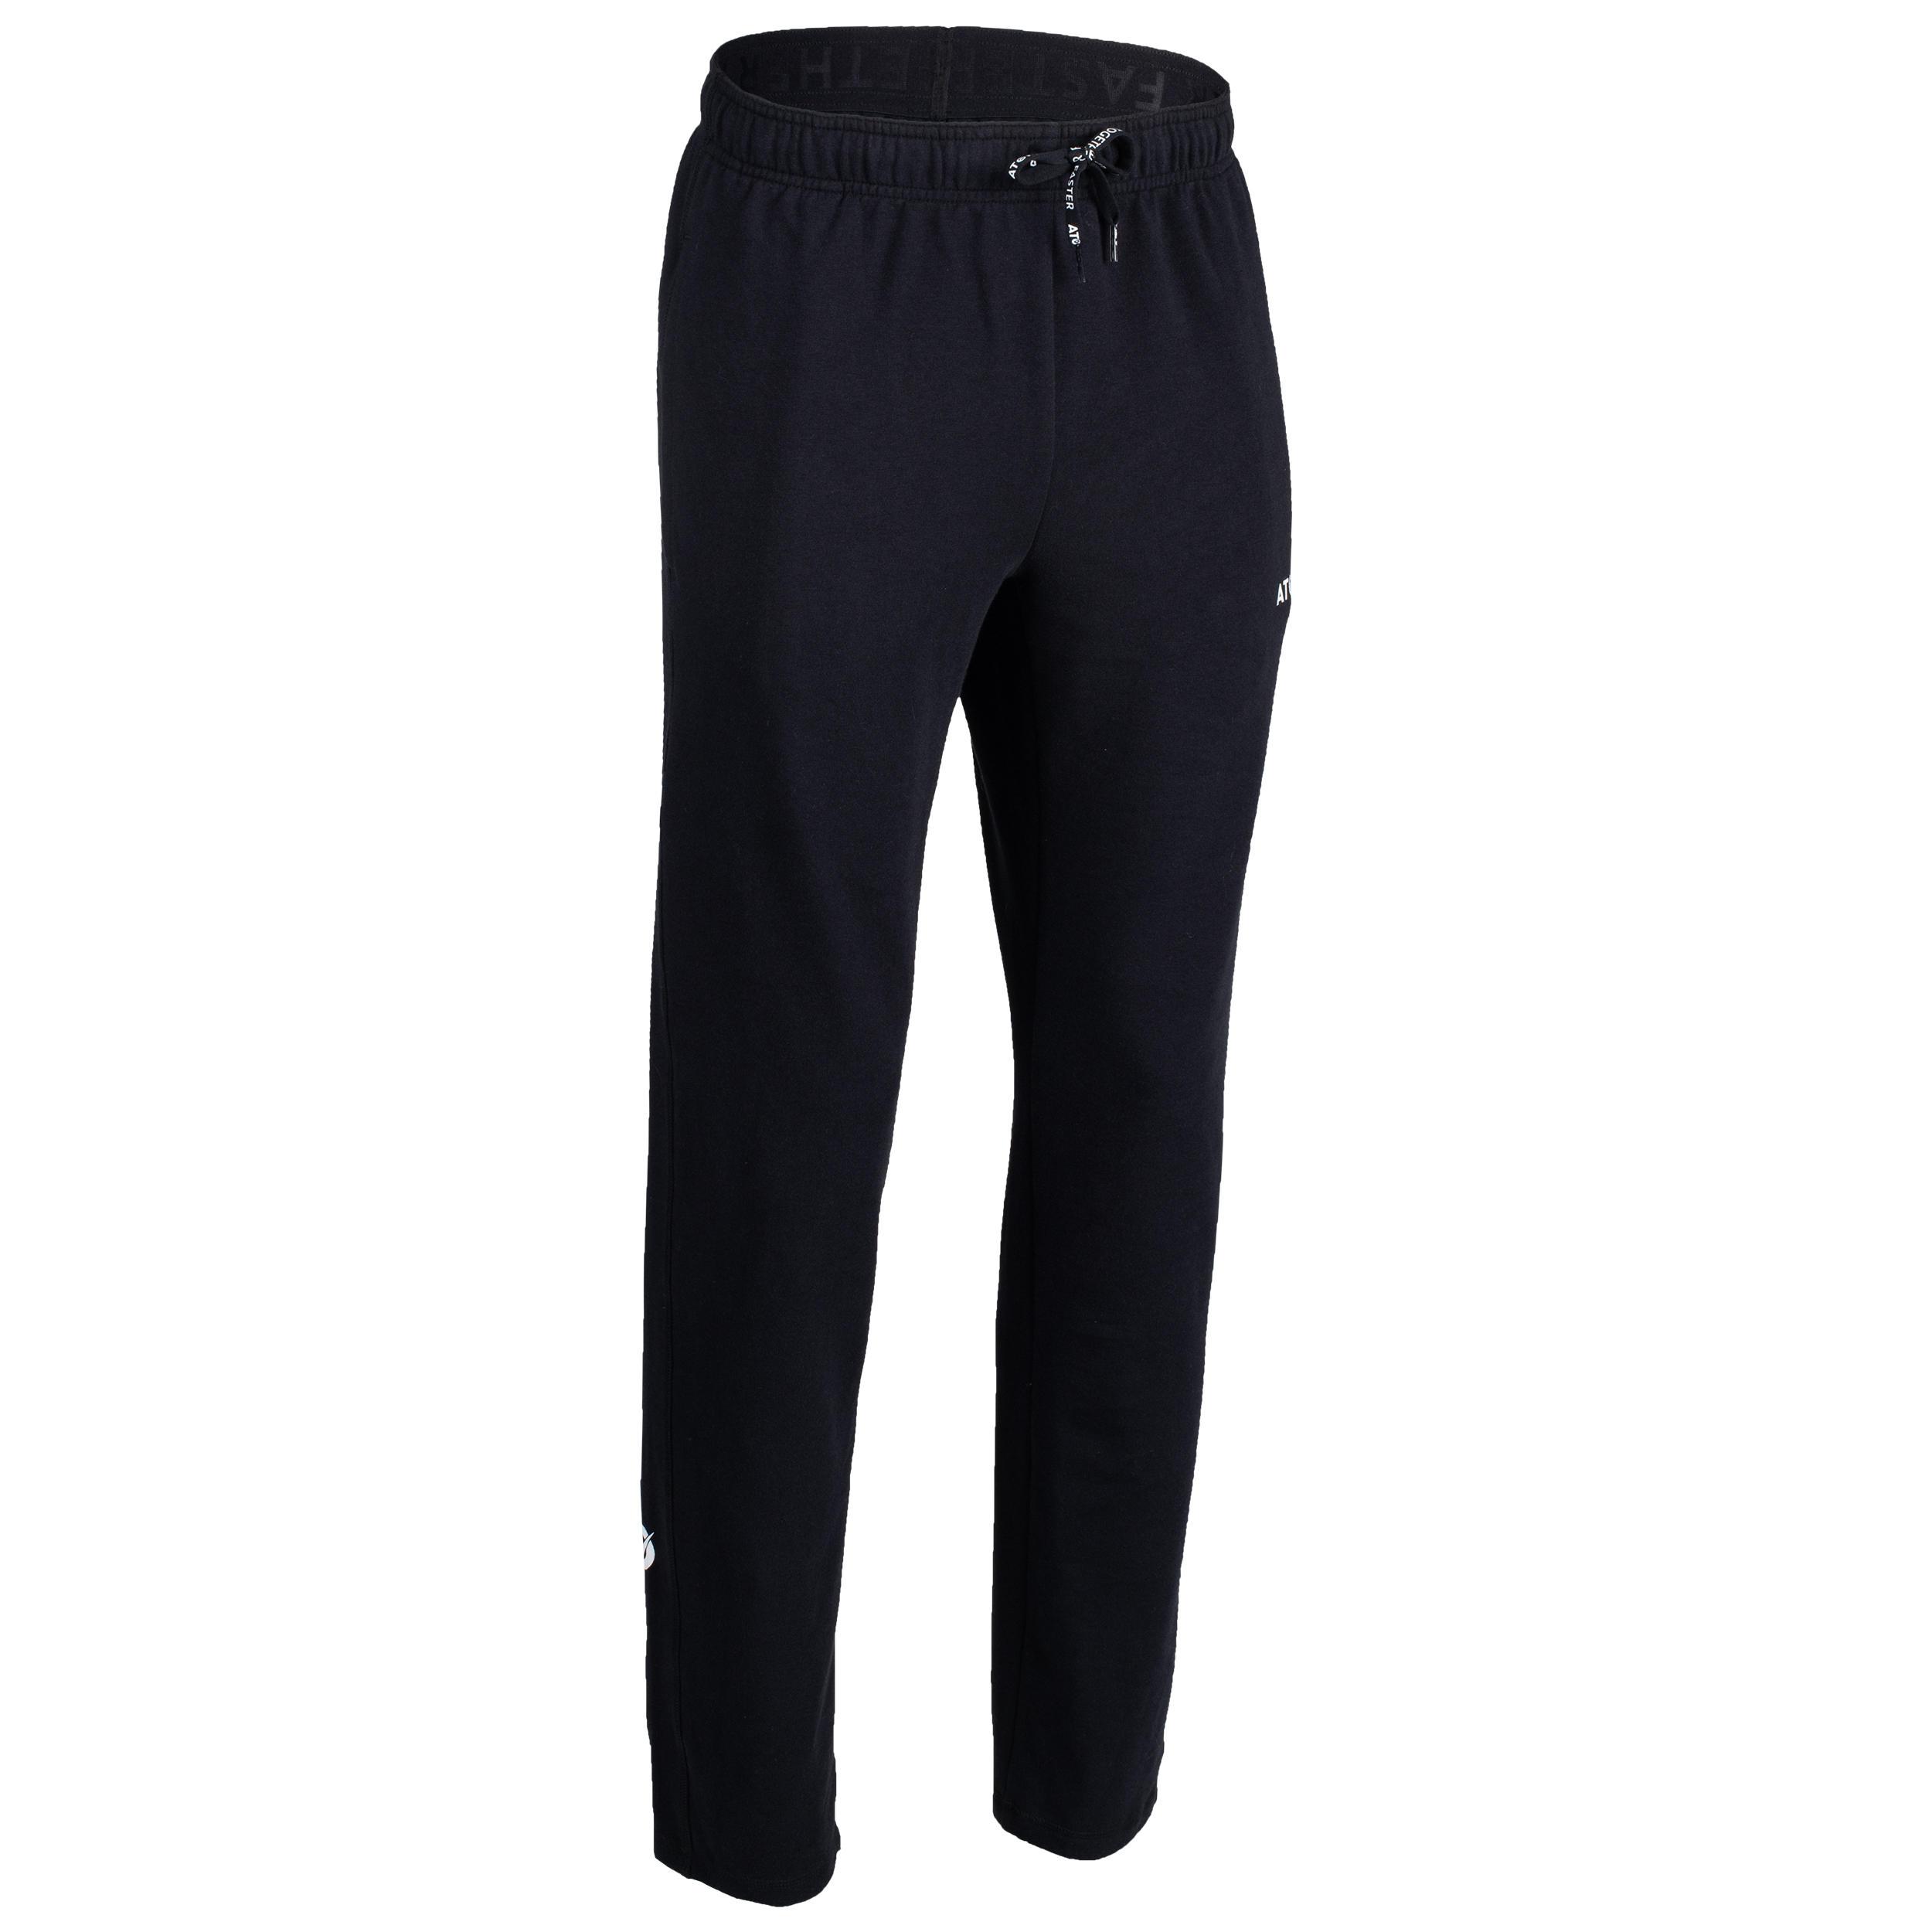 Pantalon Handbal H500 la Reducere poza